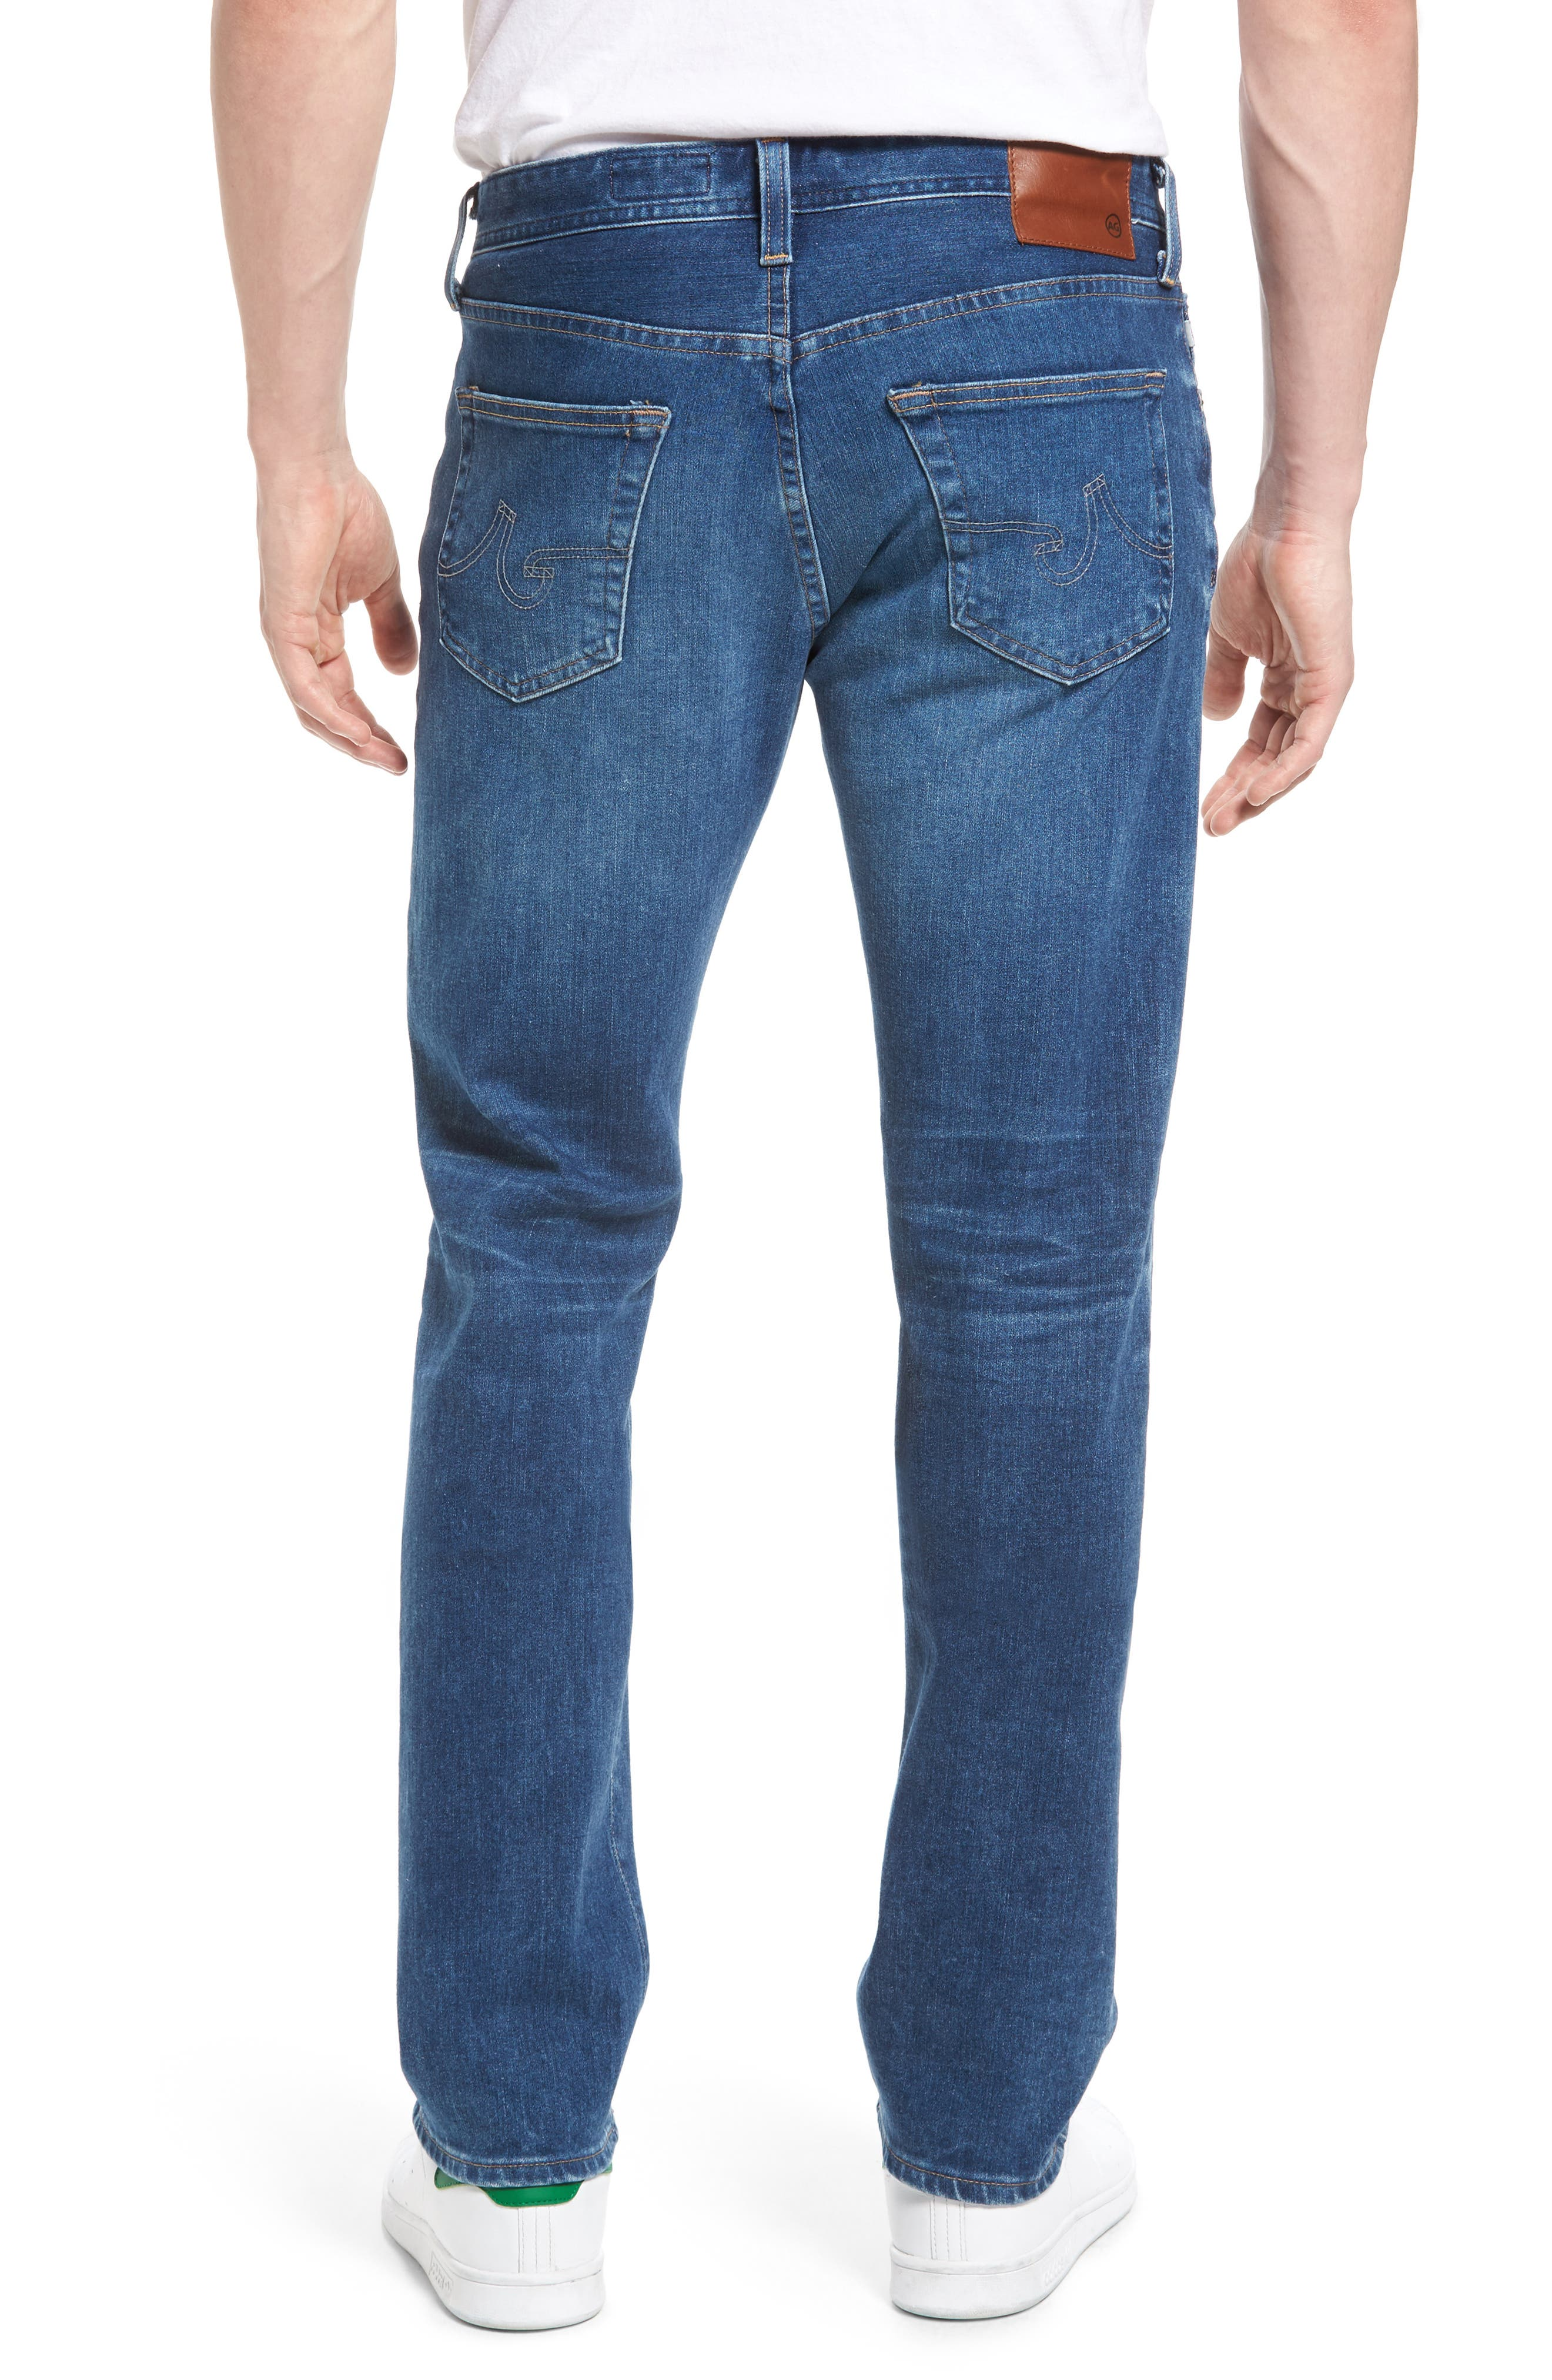 Graduate Slim Straight Leg Jeans,                             Alternate thumbnail 2, color,                             11 Years Delom